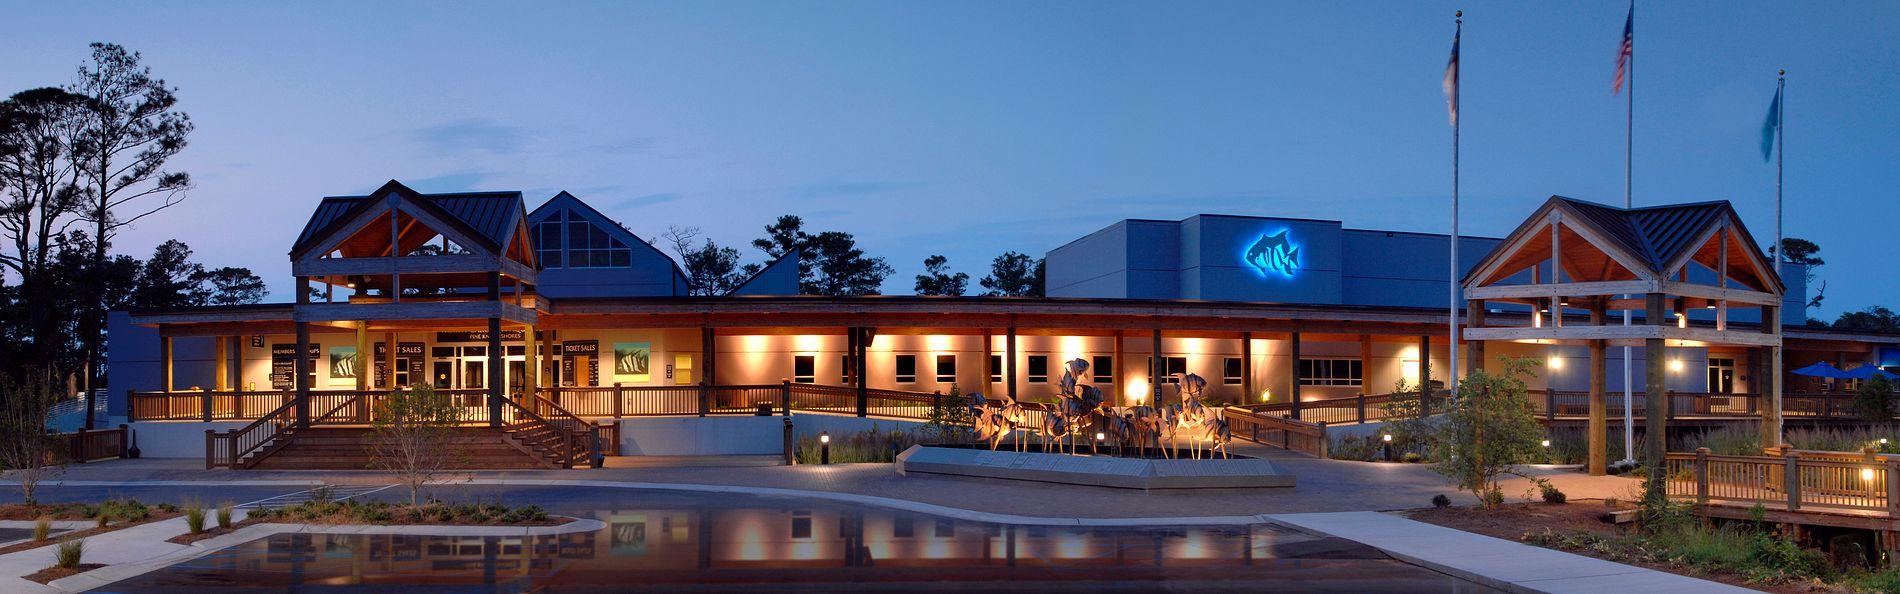 North Carolina Aquarium at Pine Knoll Shores | Clancy ...